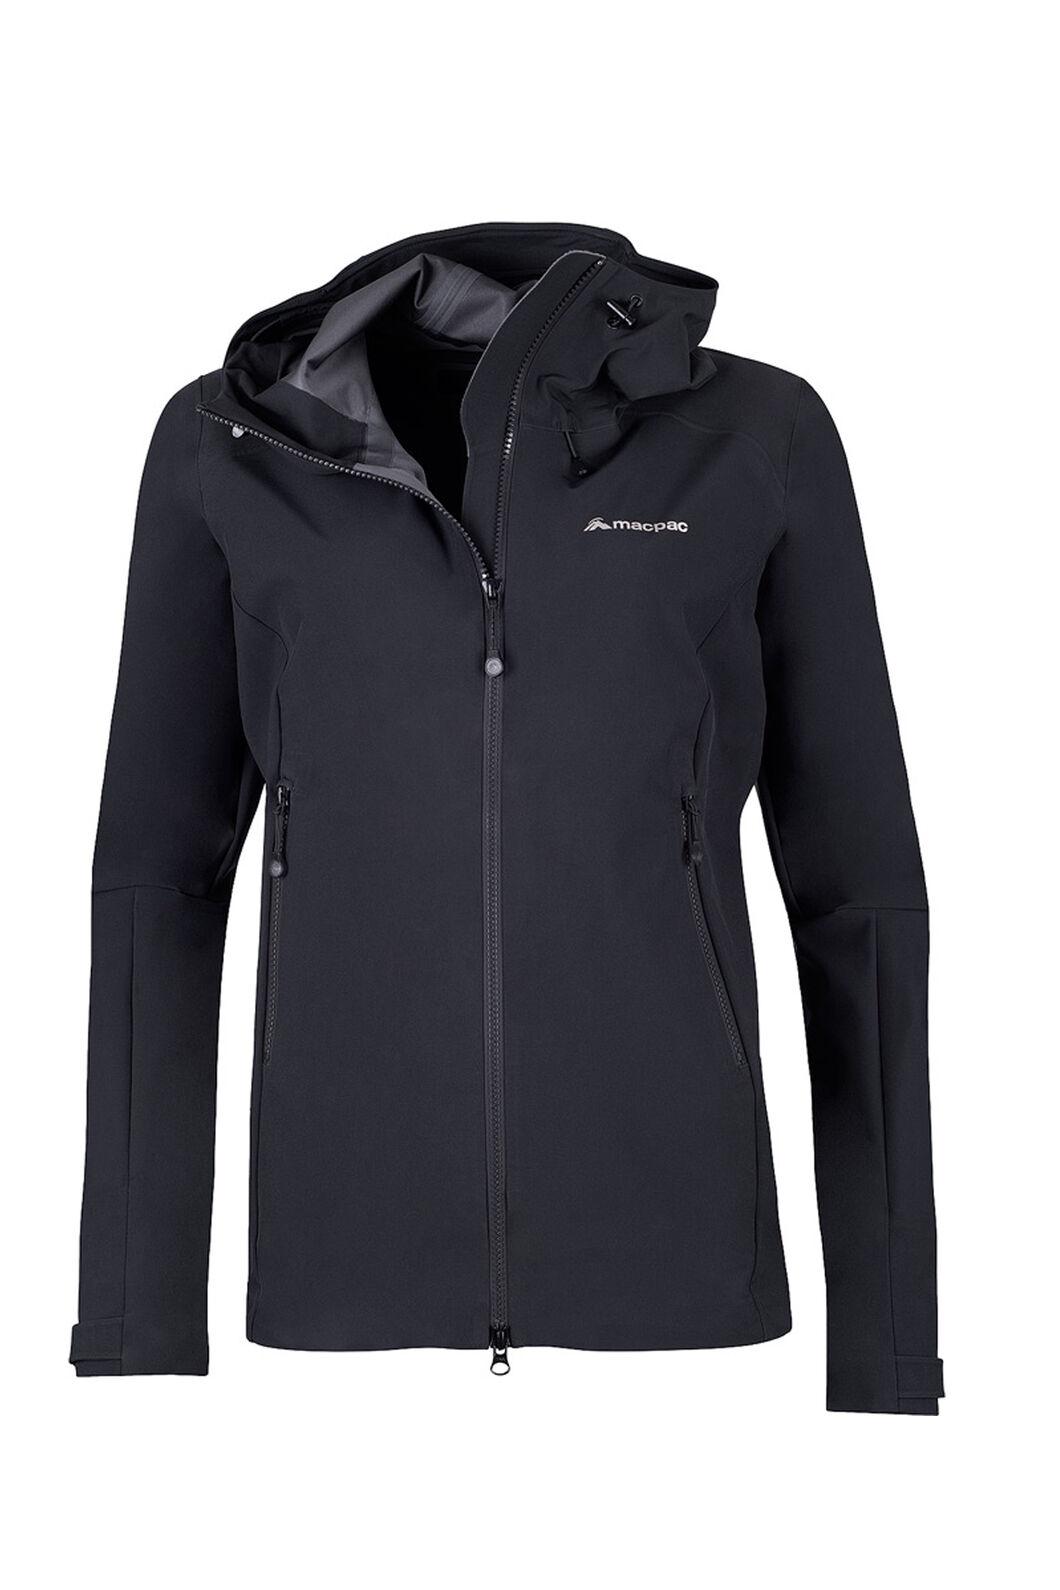 Macpac Fitzroy Alpine Series Softshell Jacket - Women's, Black, hi-res